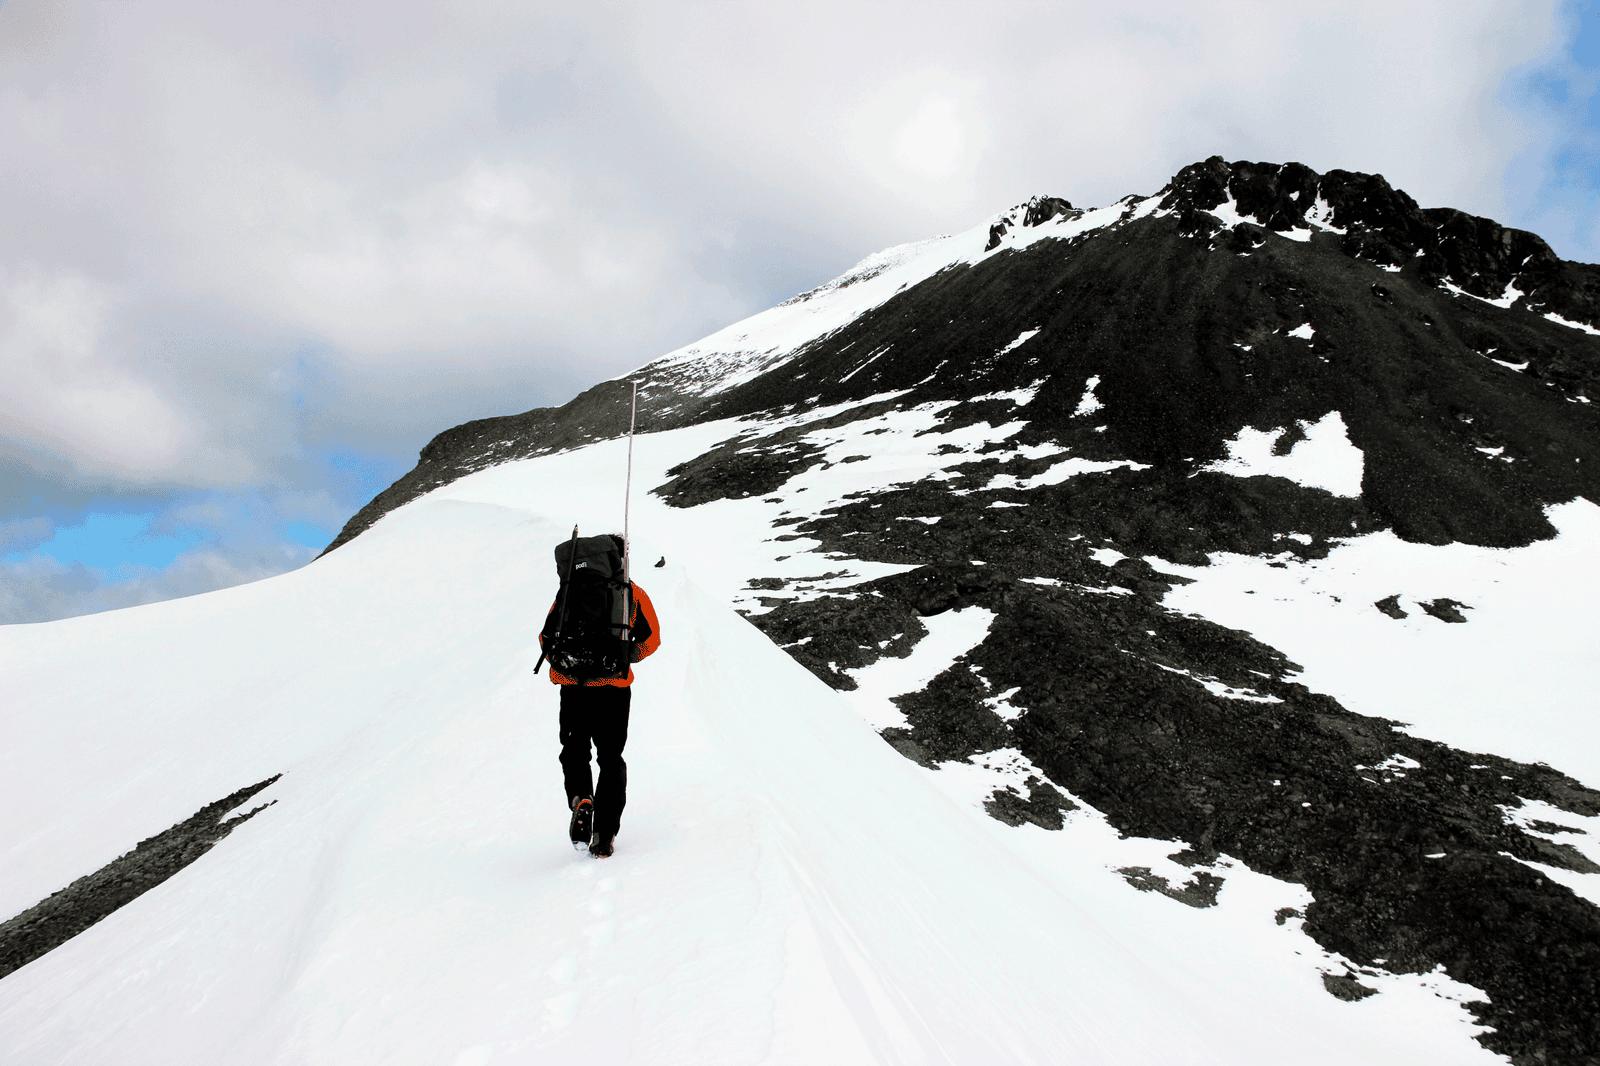 Stef Bokhorst exploring snow ridge toward mountain peak on Jenny Island